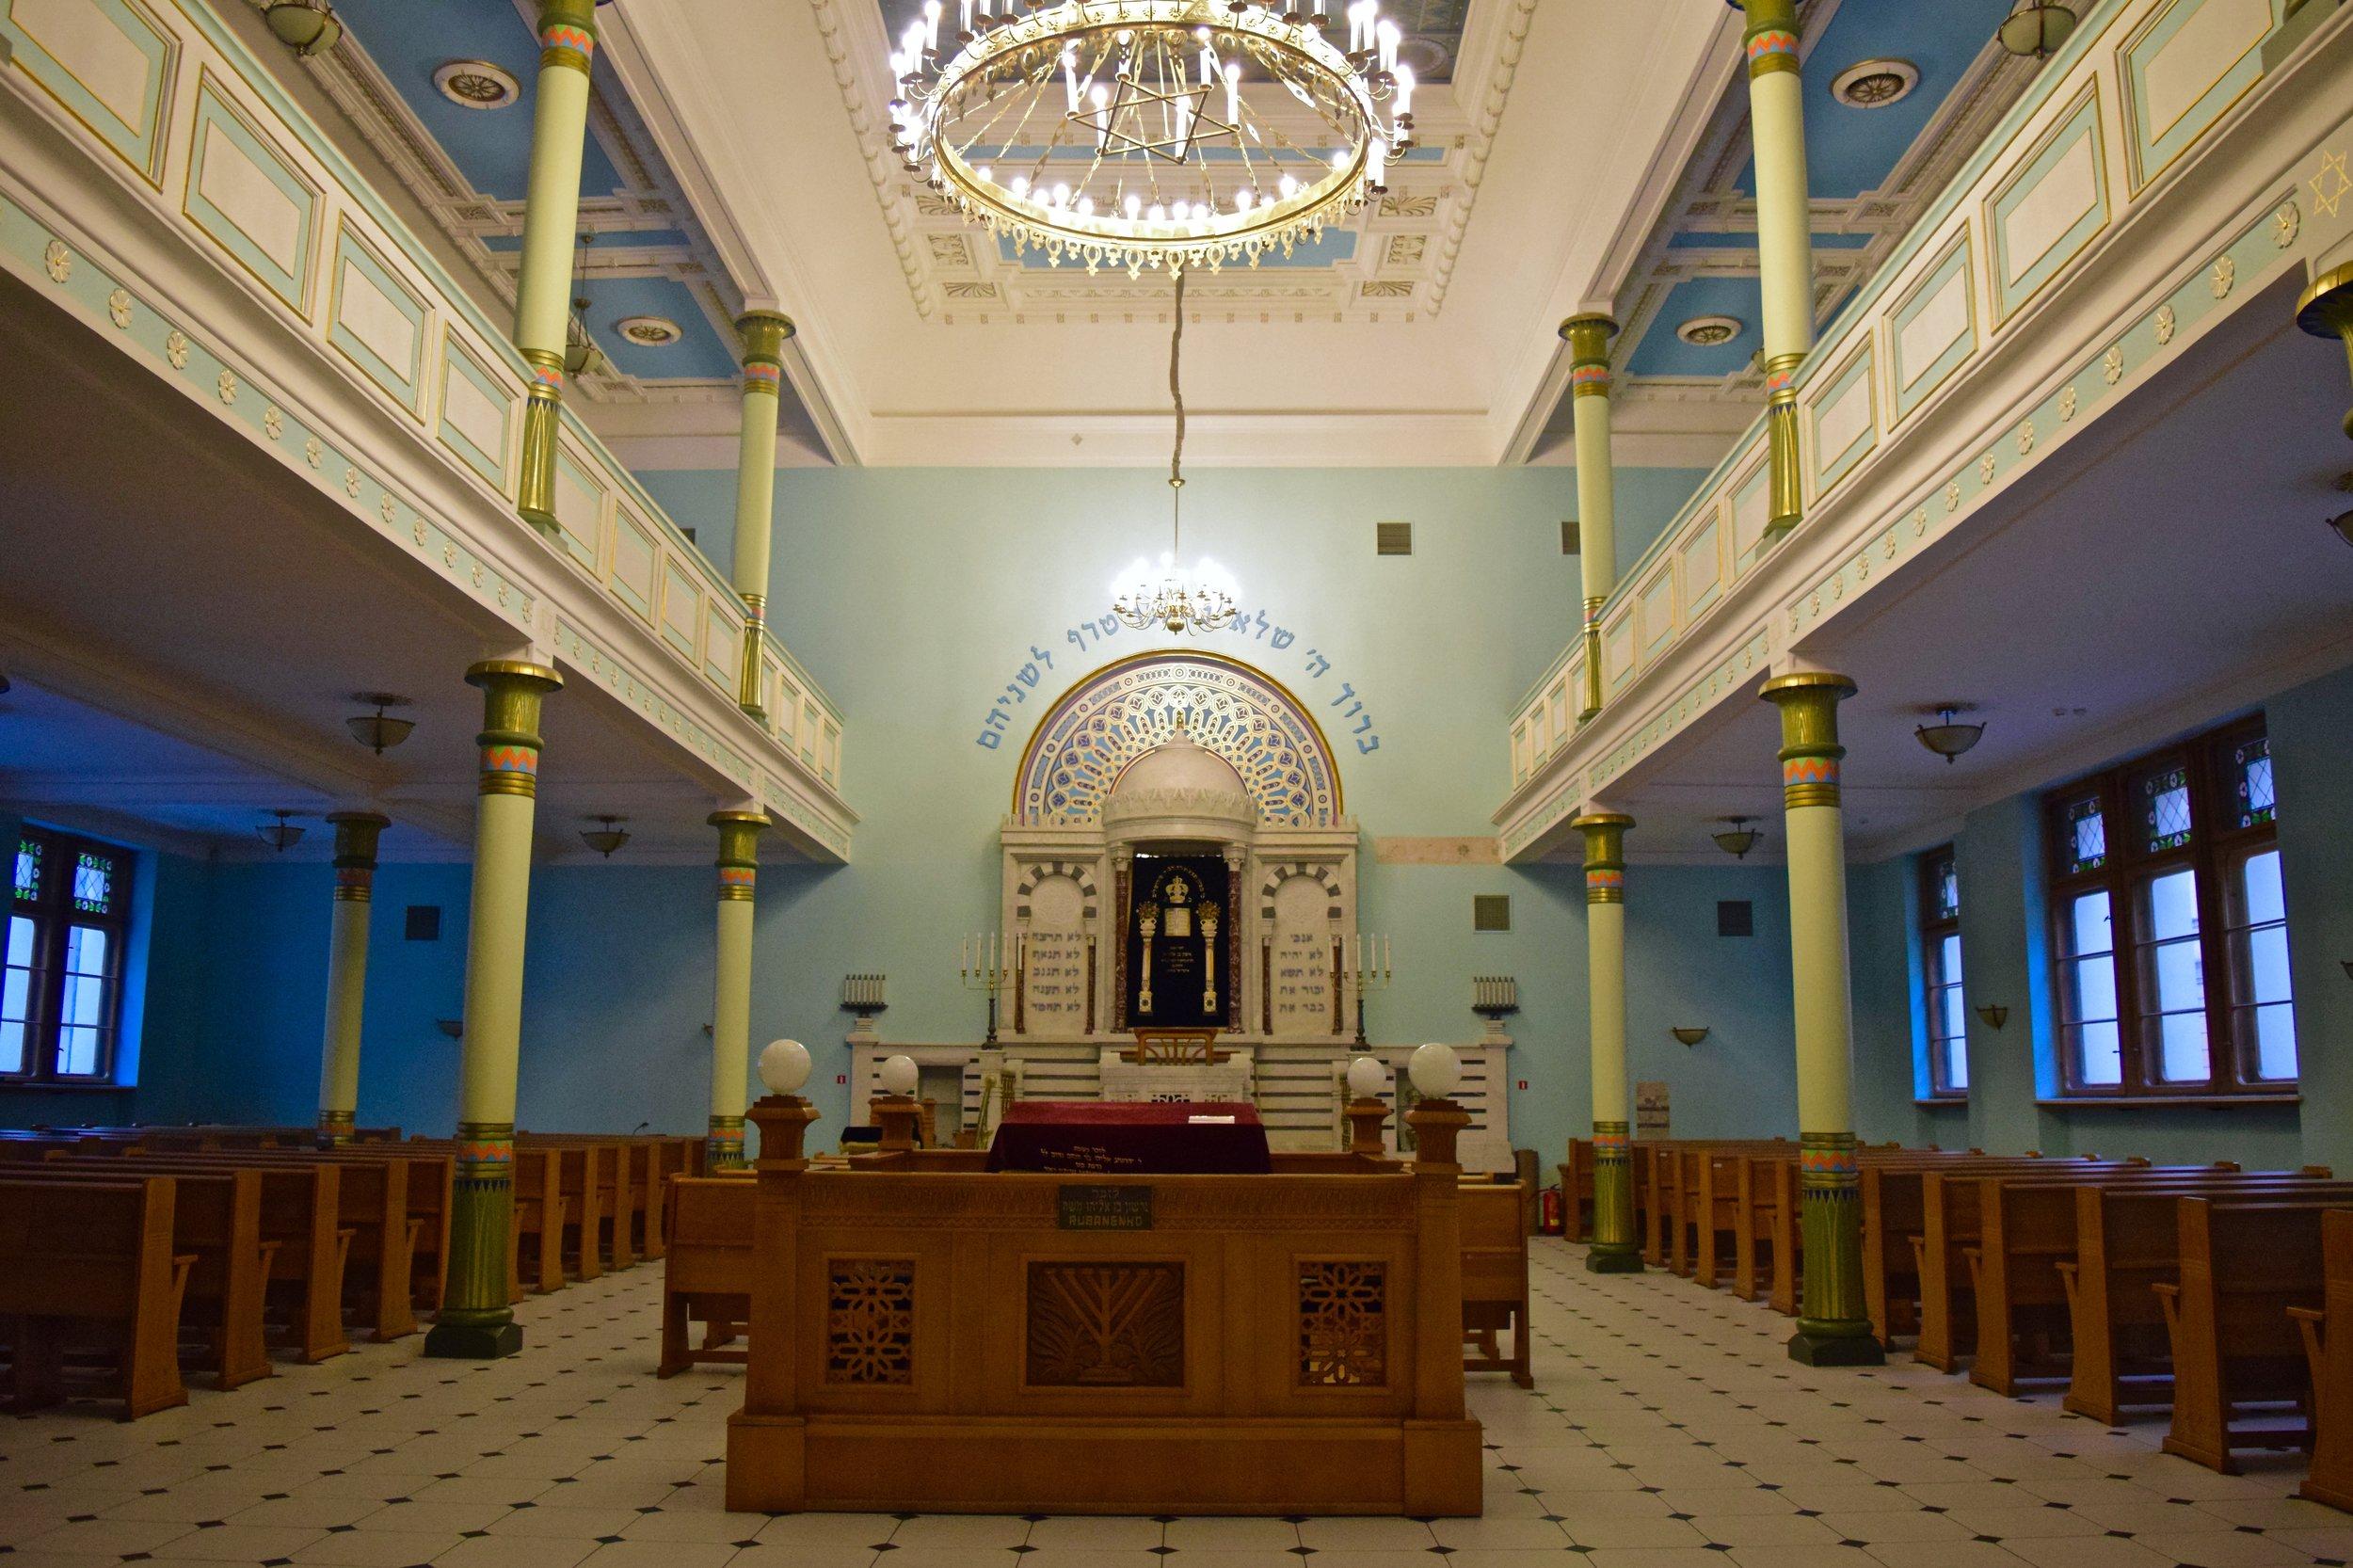 Peitav-Shul Synagogue